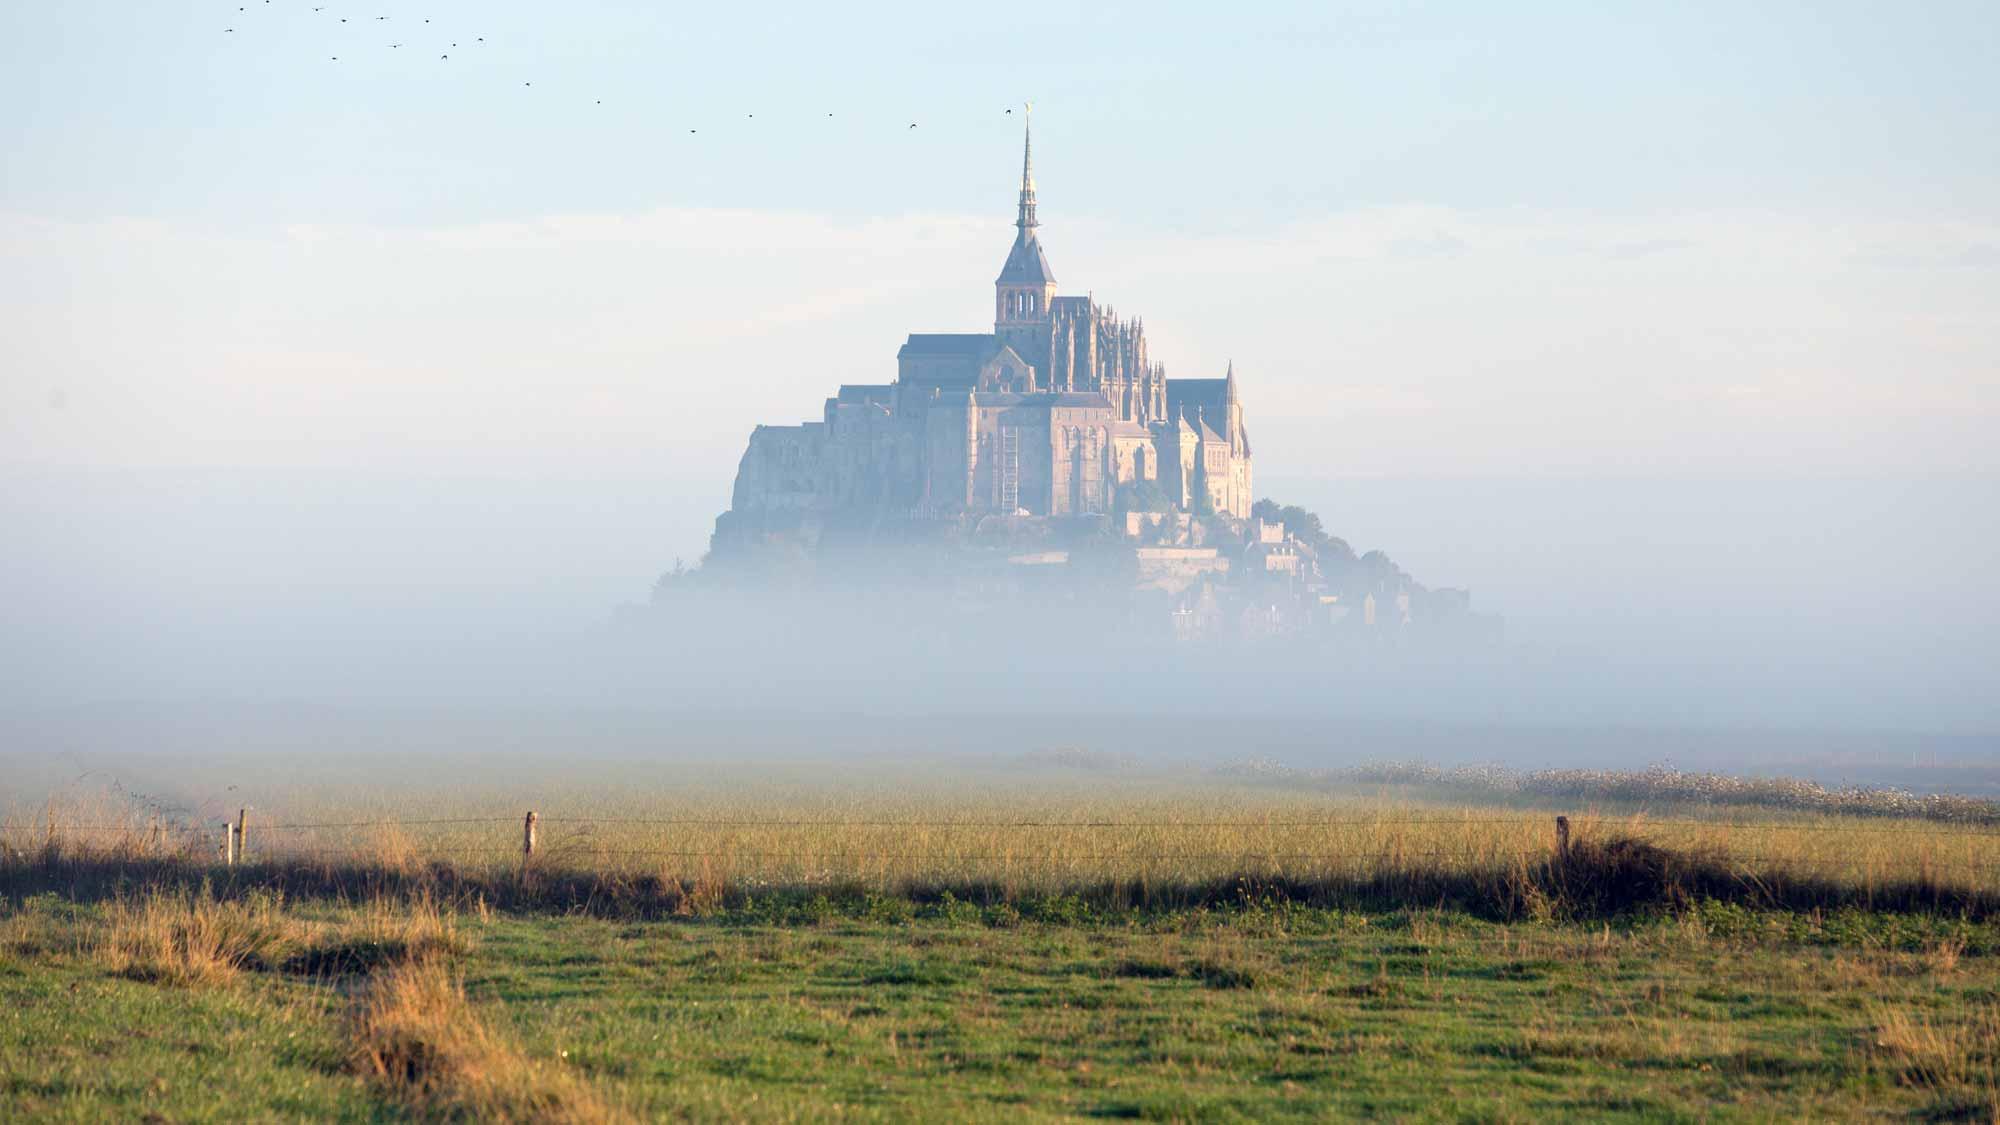 baie-du-mont-saint-michel-04.jpg